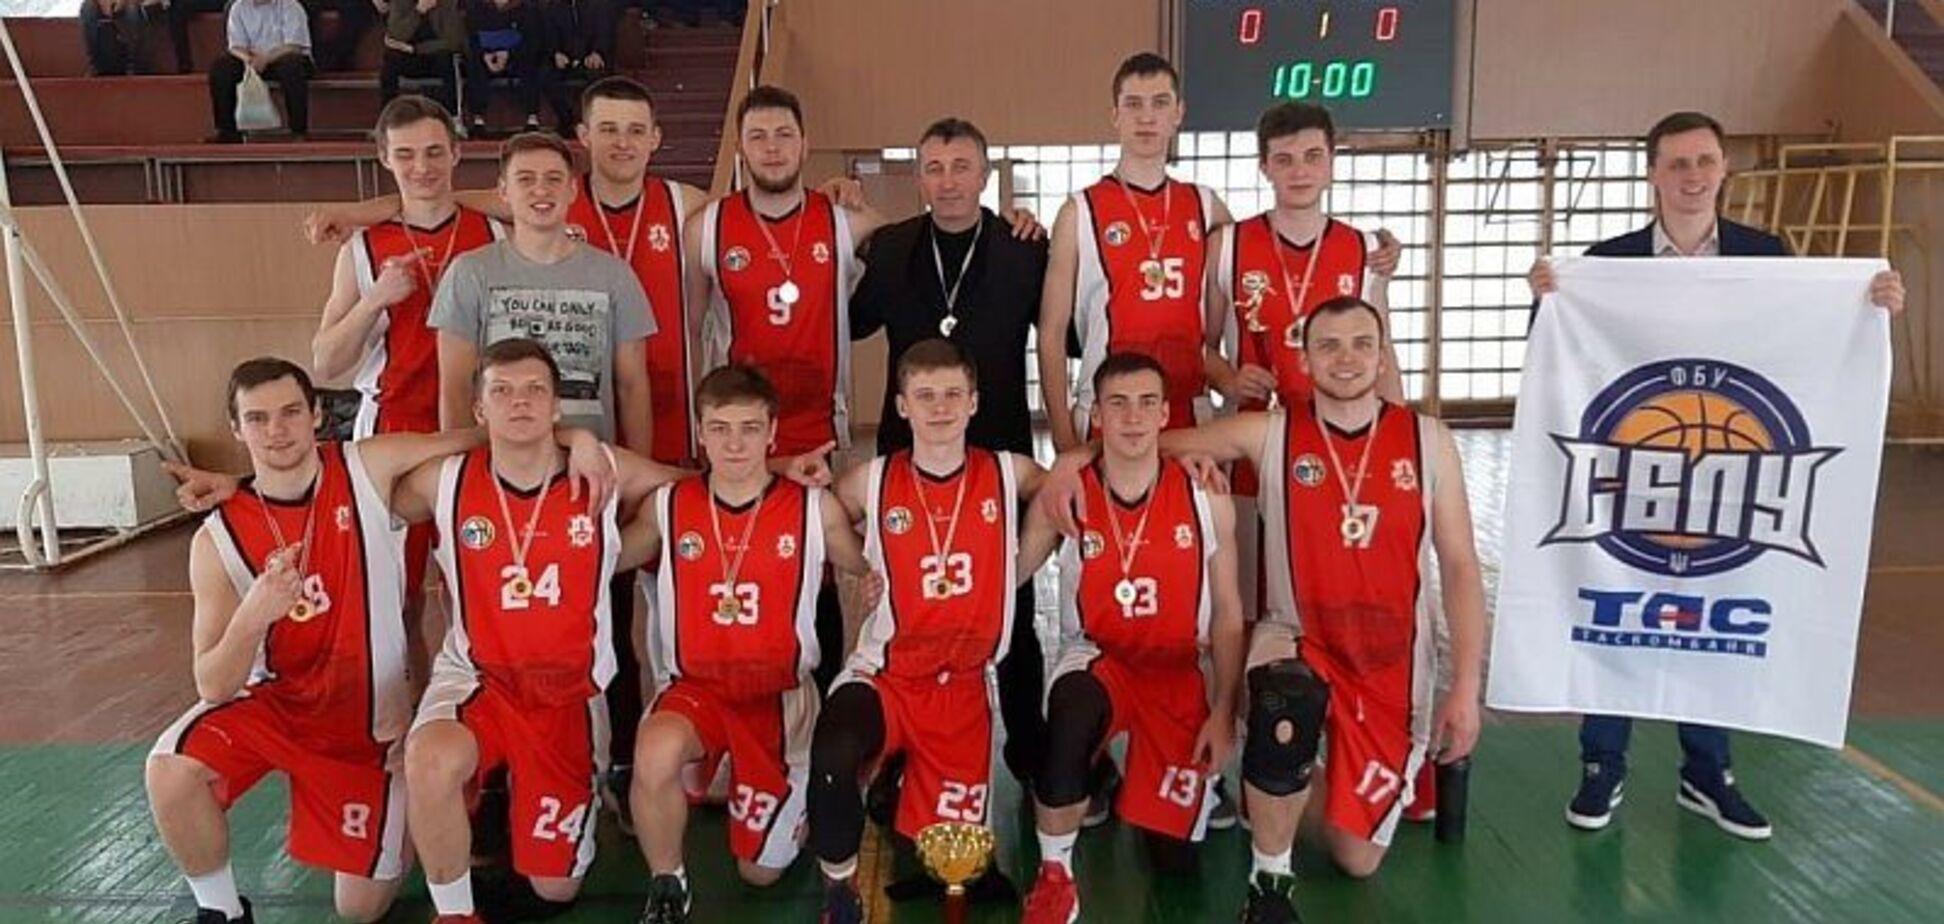 СБЛУ Таскомбанк: определились победители дивизиона Запад